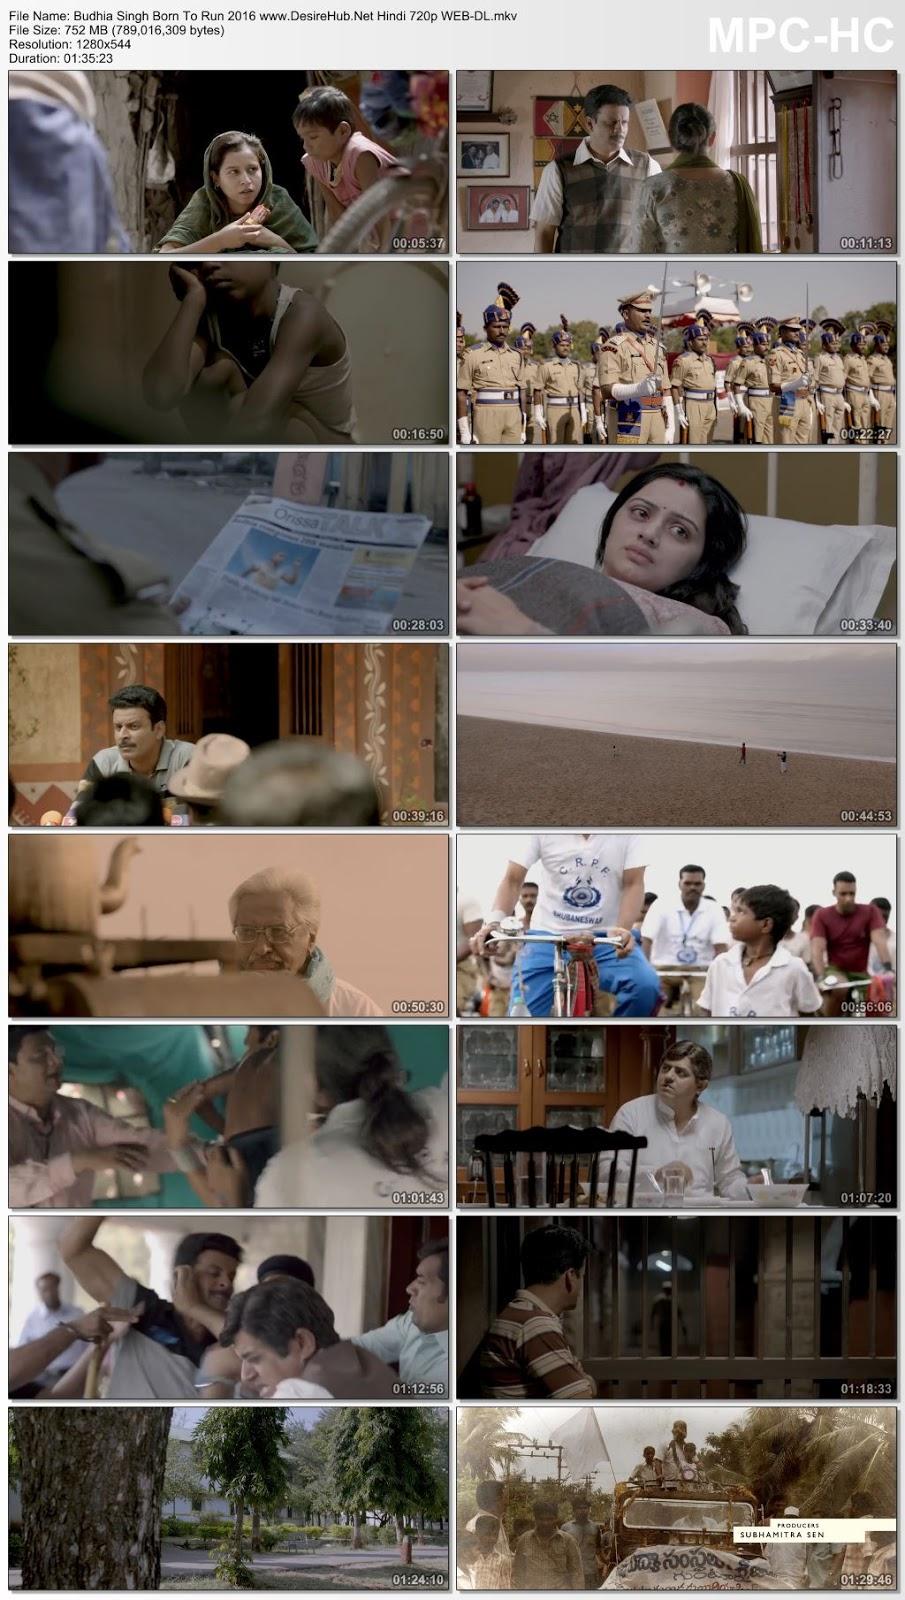 Budhia Singh Born To Run 2016 Hindi 720p WEB-DL 750MB Desirehub